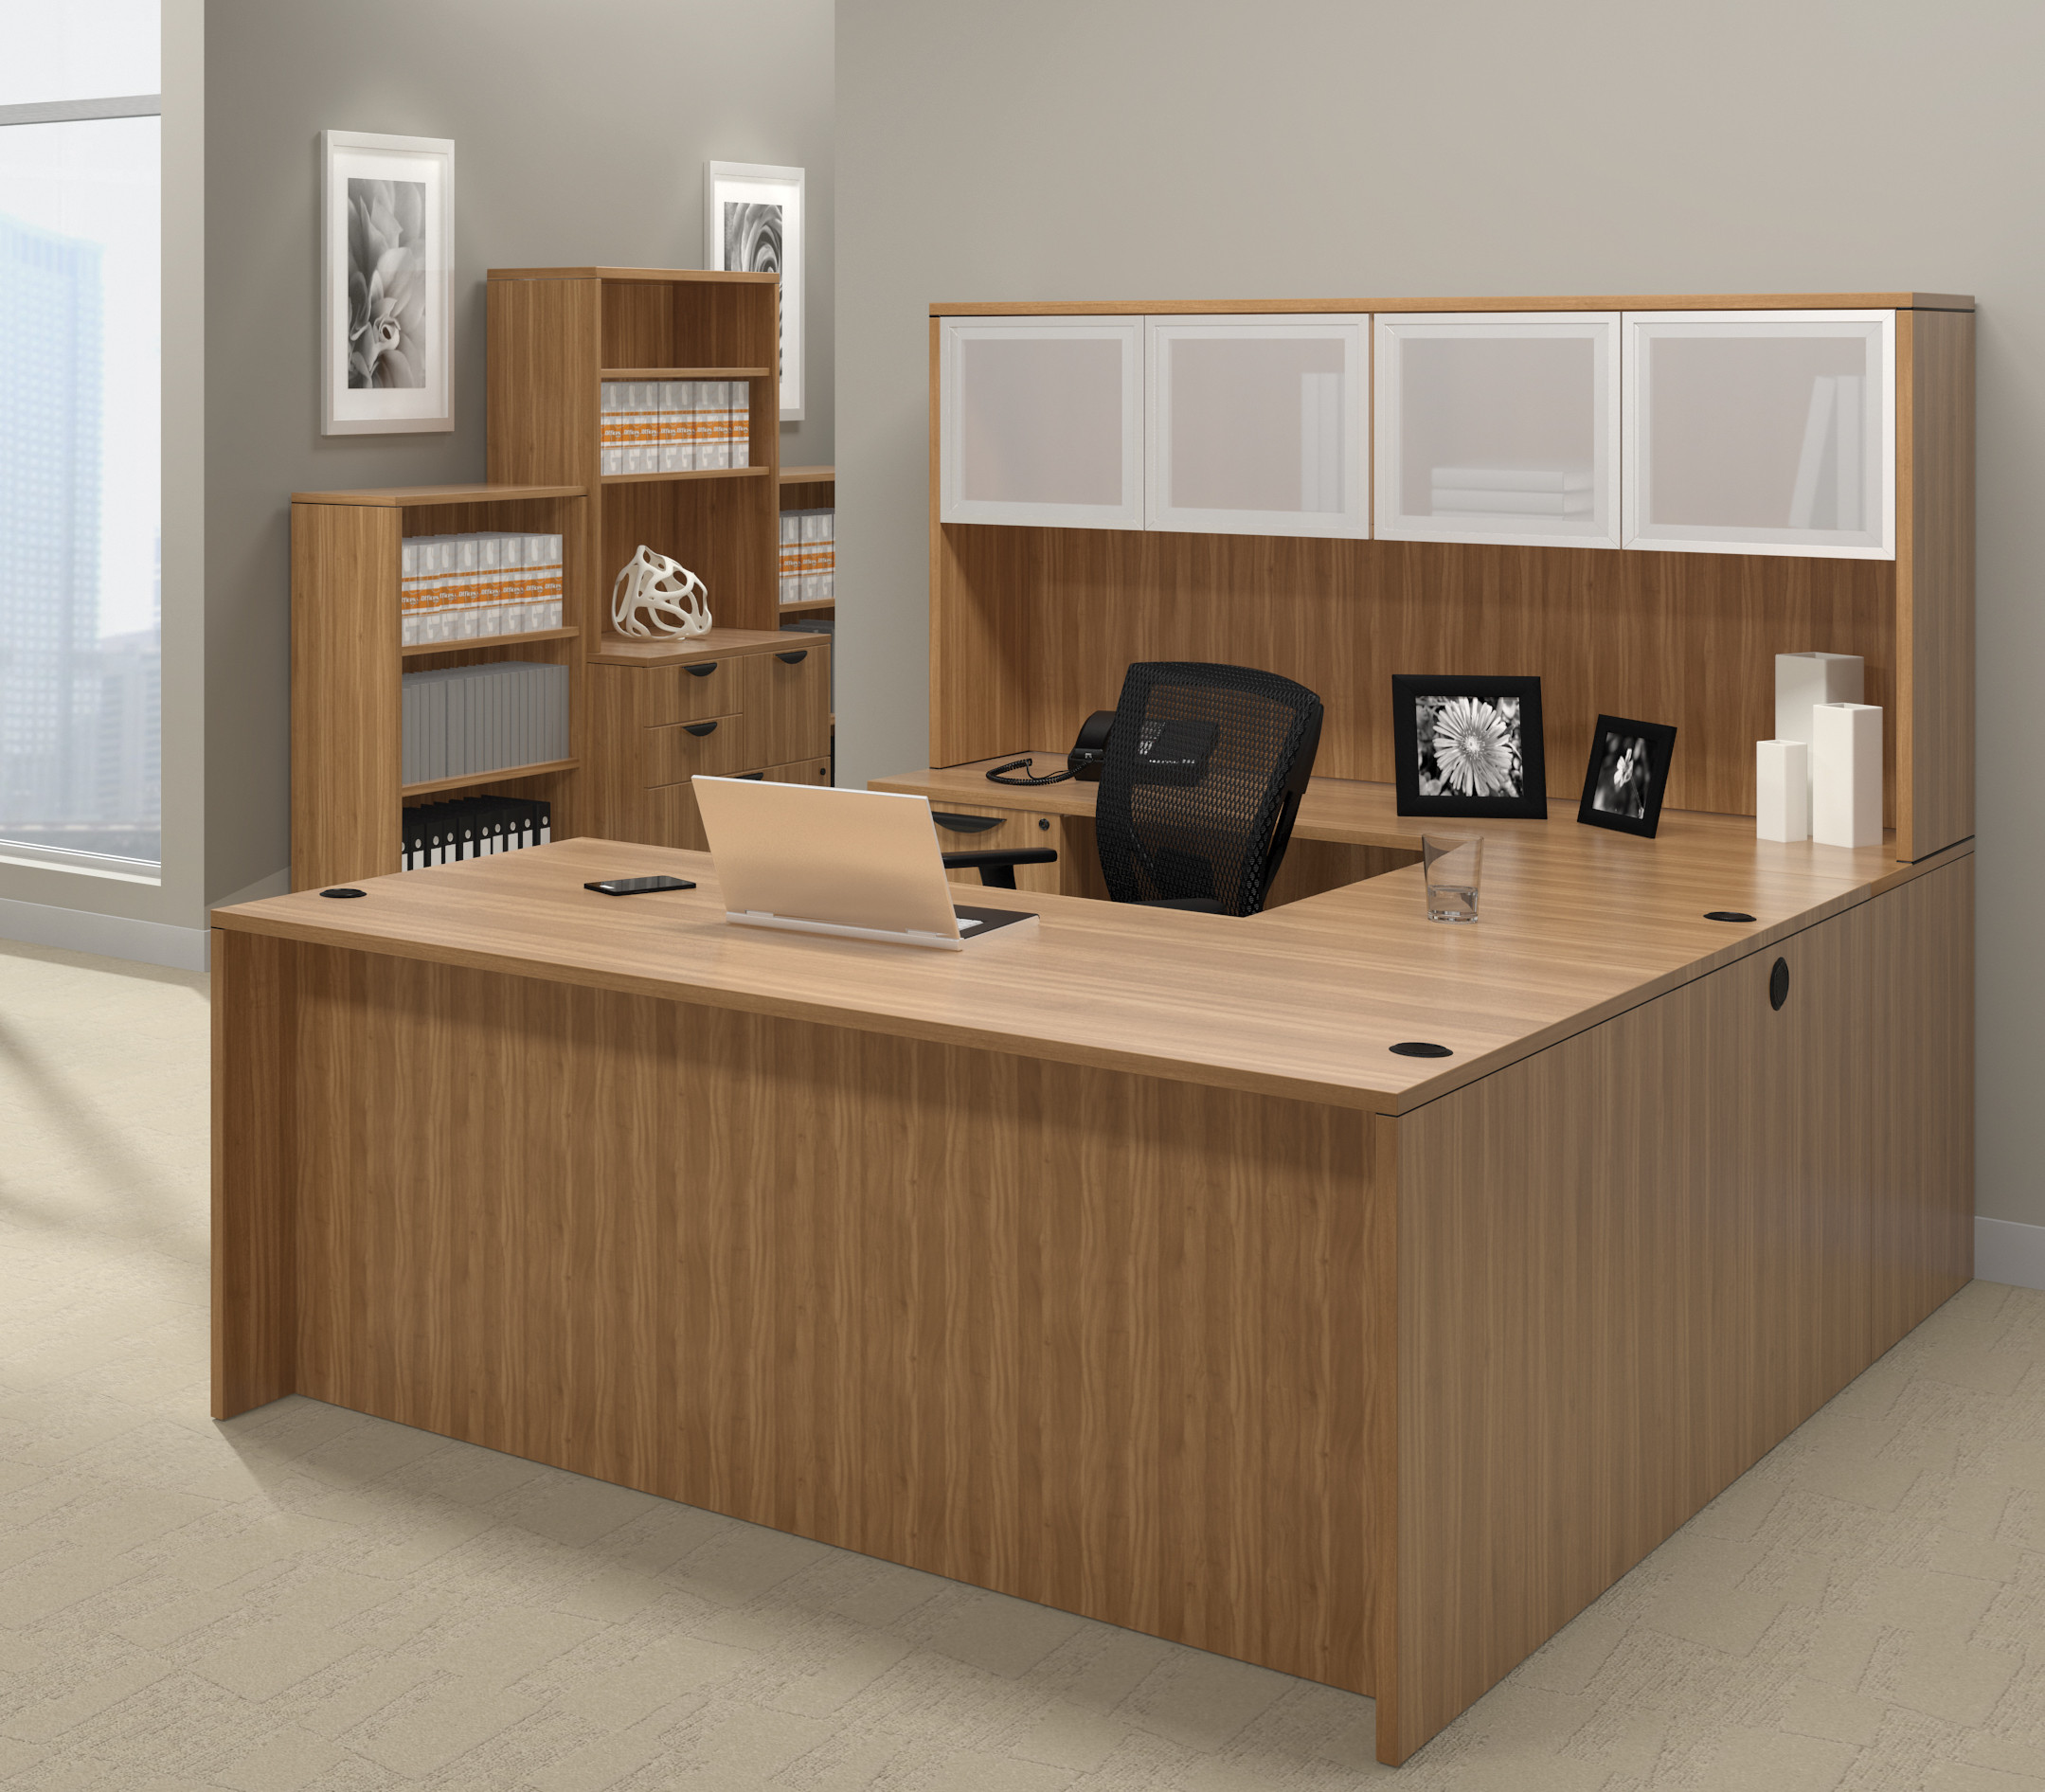 offices to go superior laminate u-shaped workstation with walnut finish